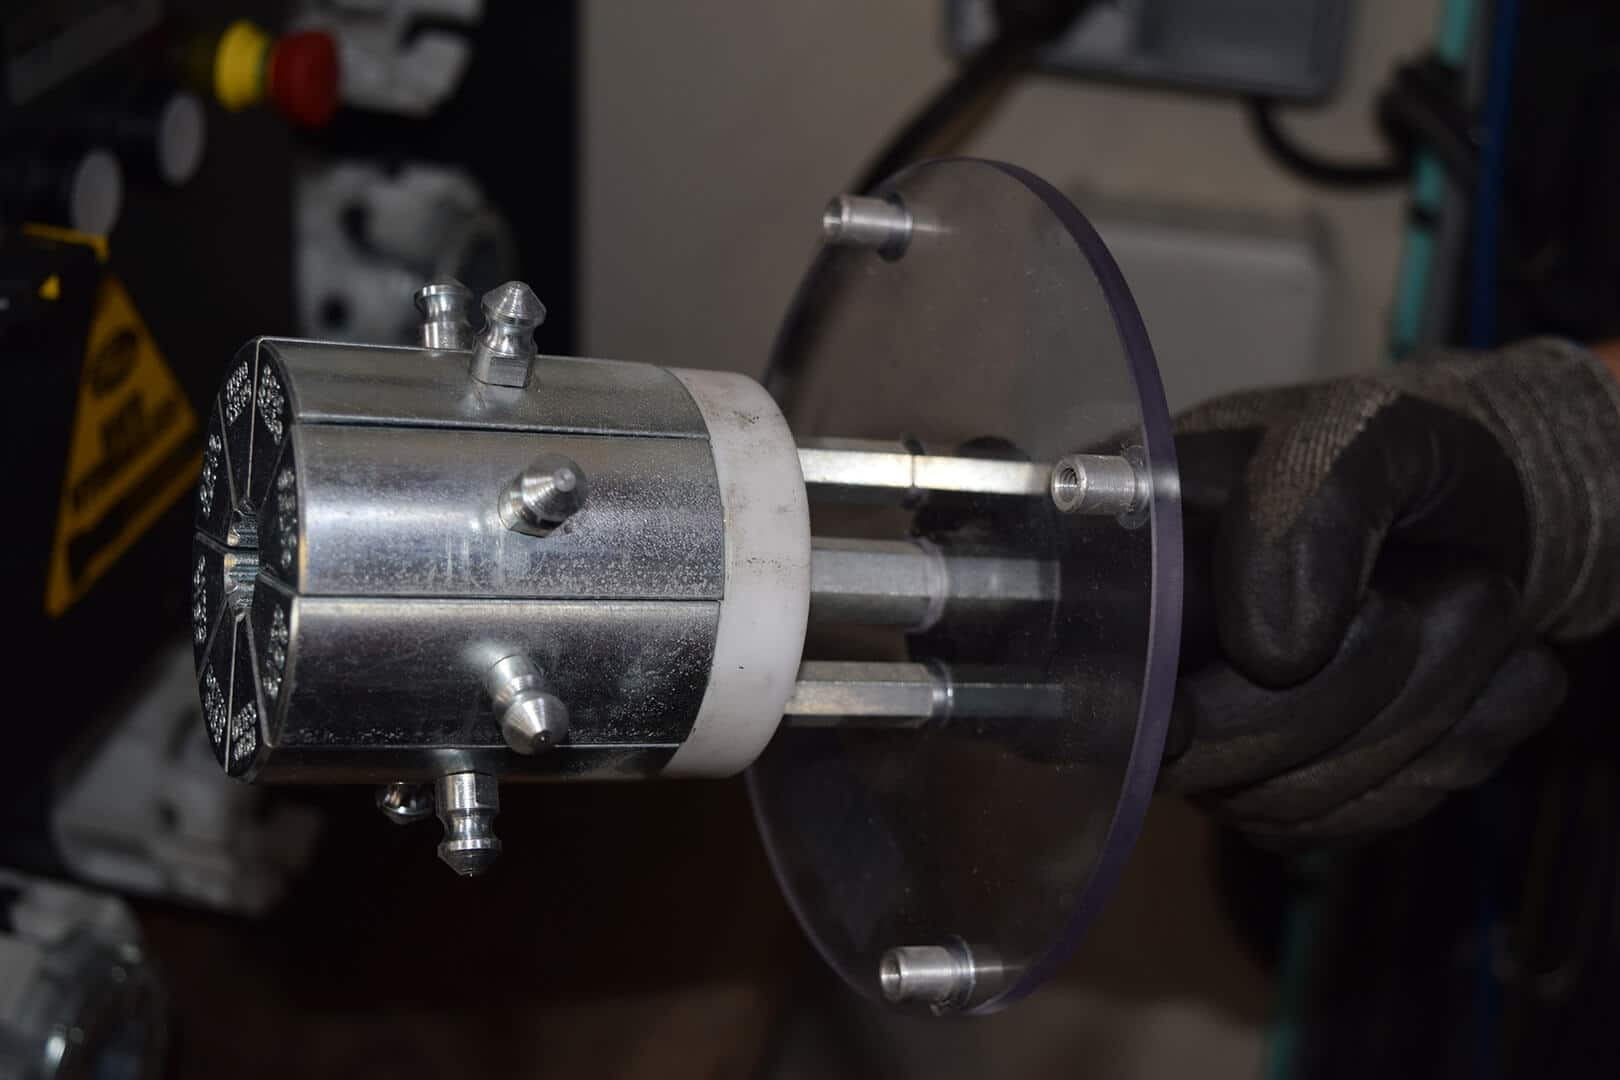 DSC 0046 - Flexibles Hydrauliques